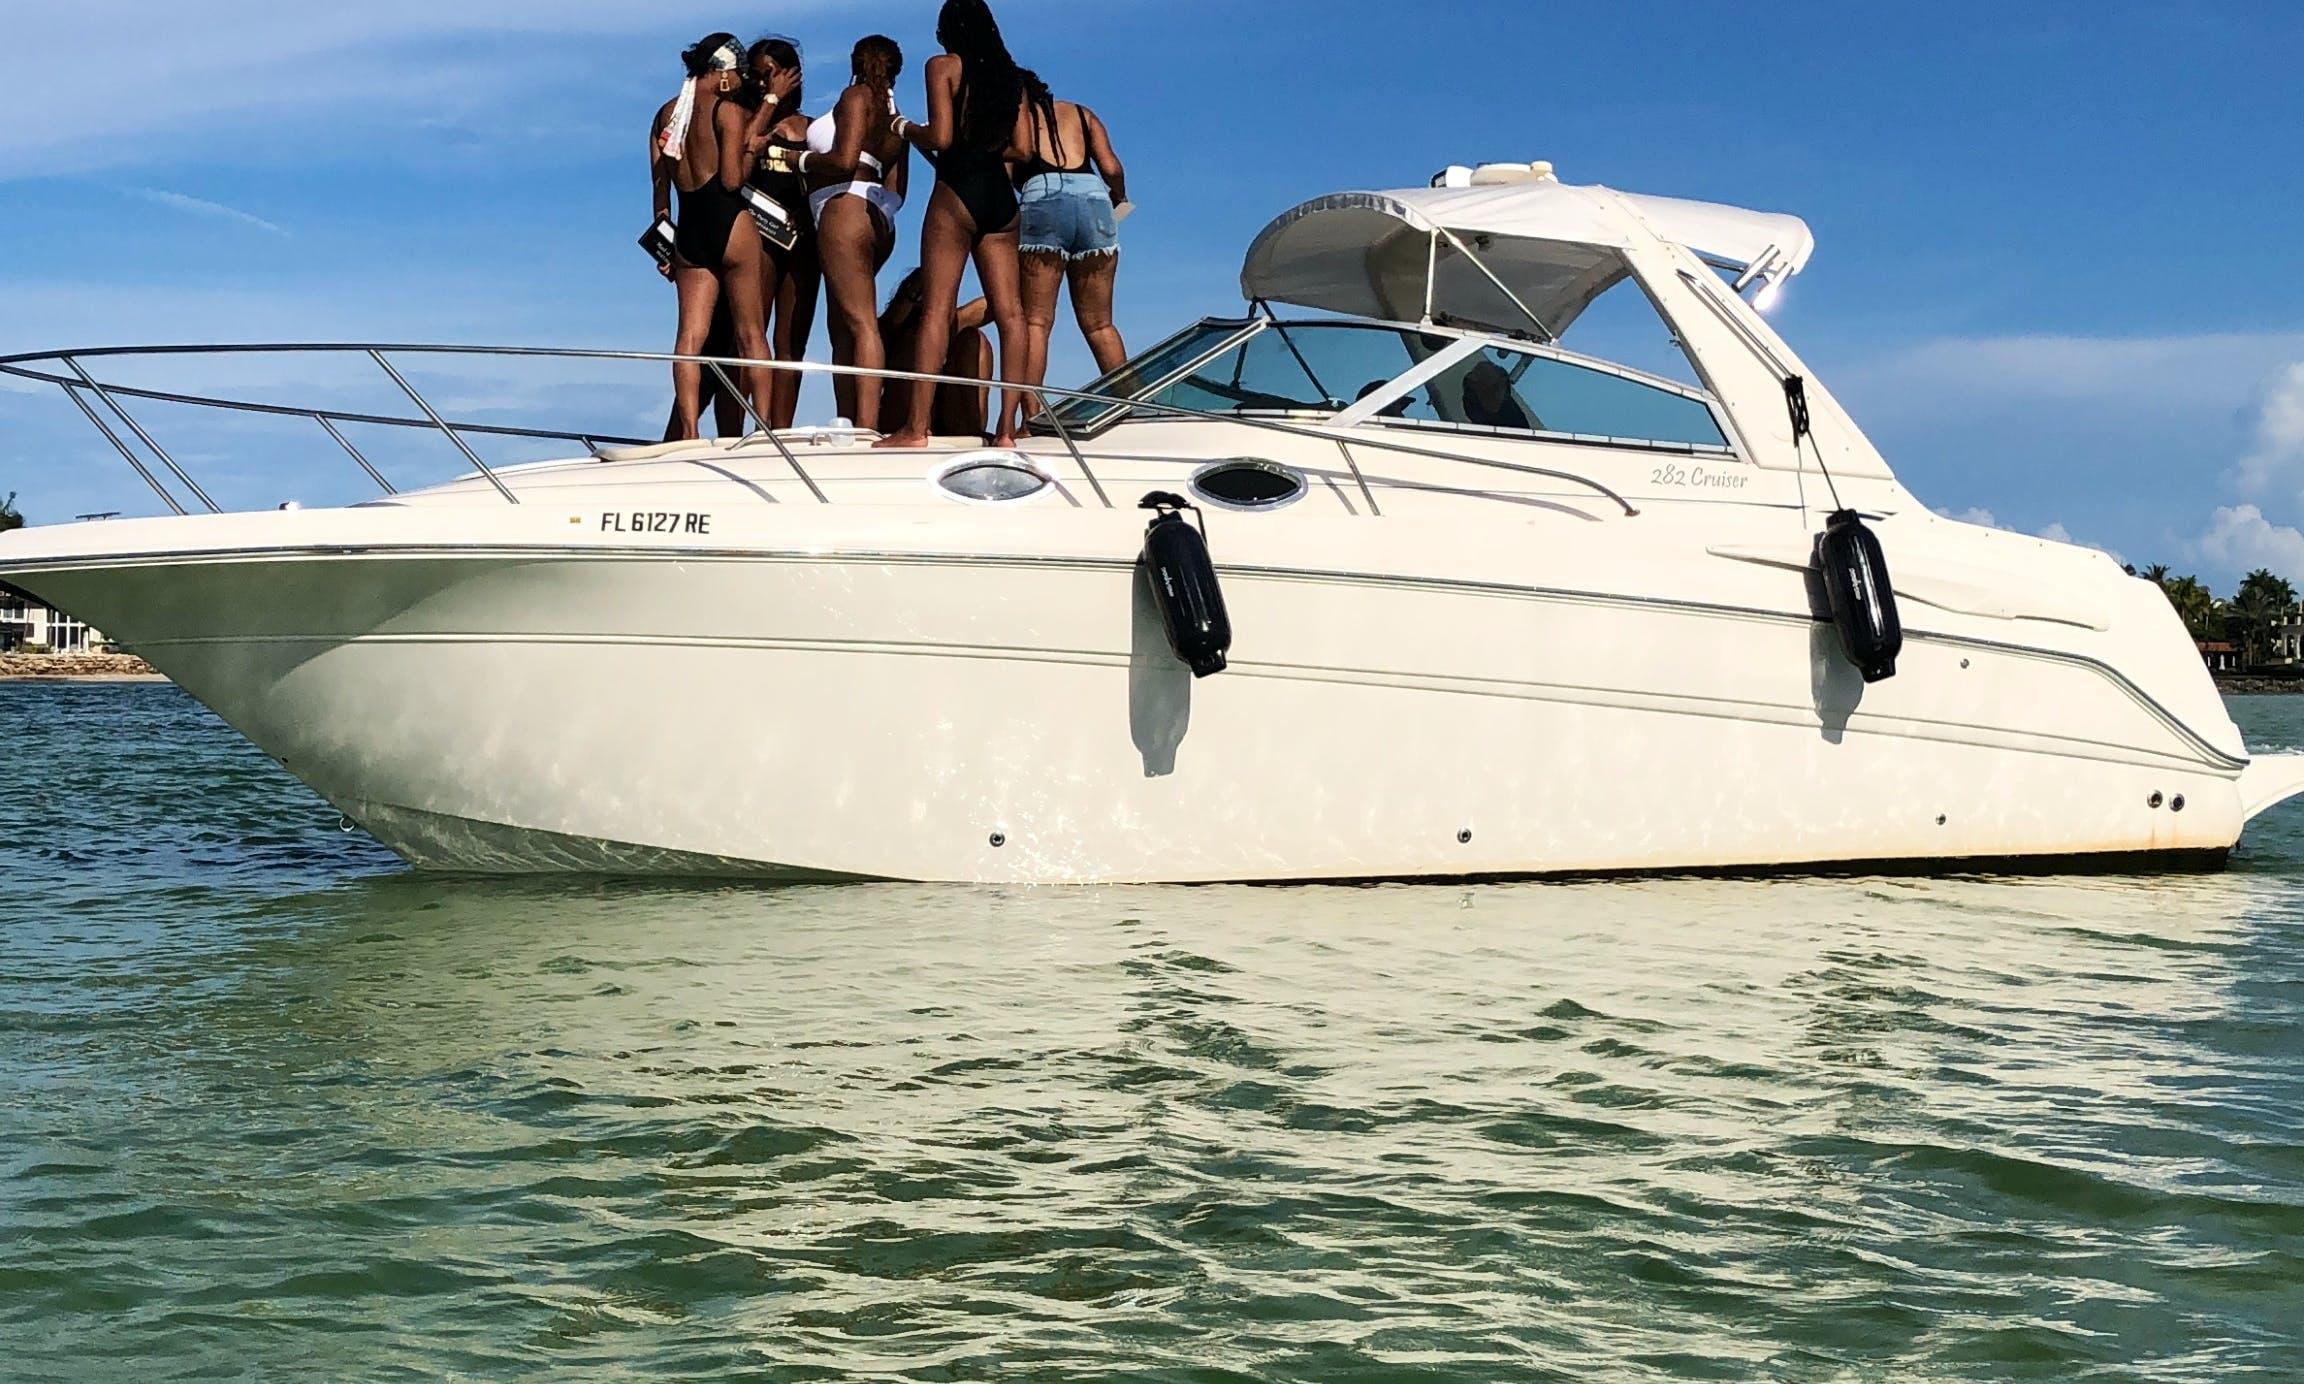 "Cruiser 33"" Yacht rental in Miami"